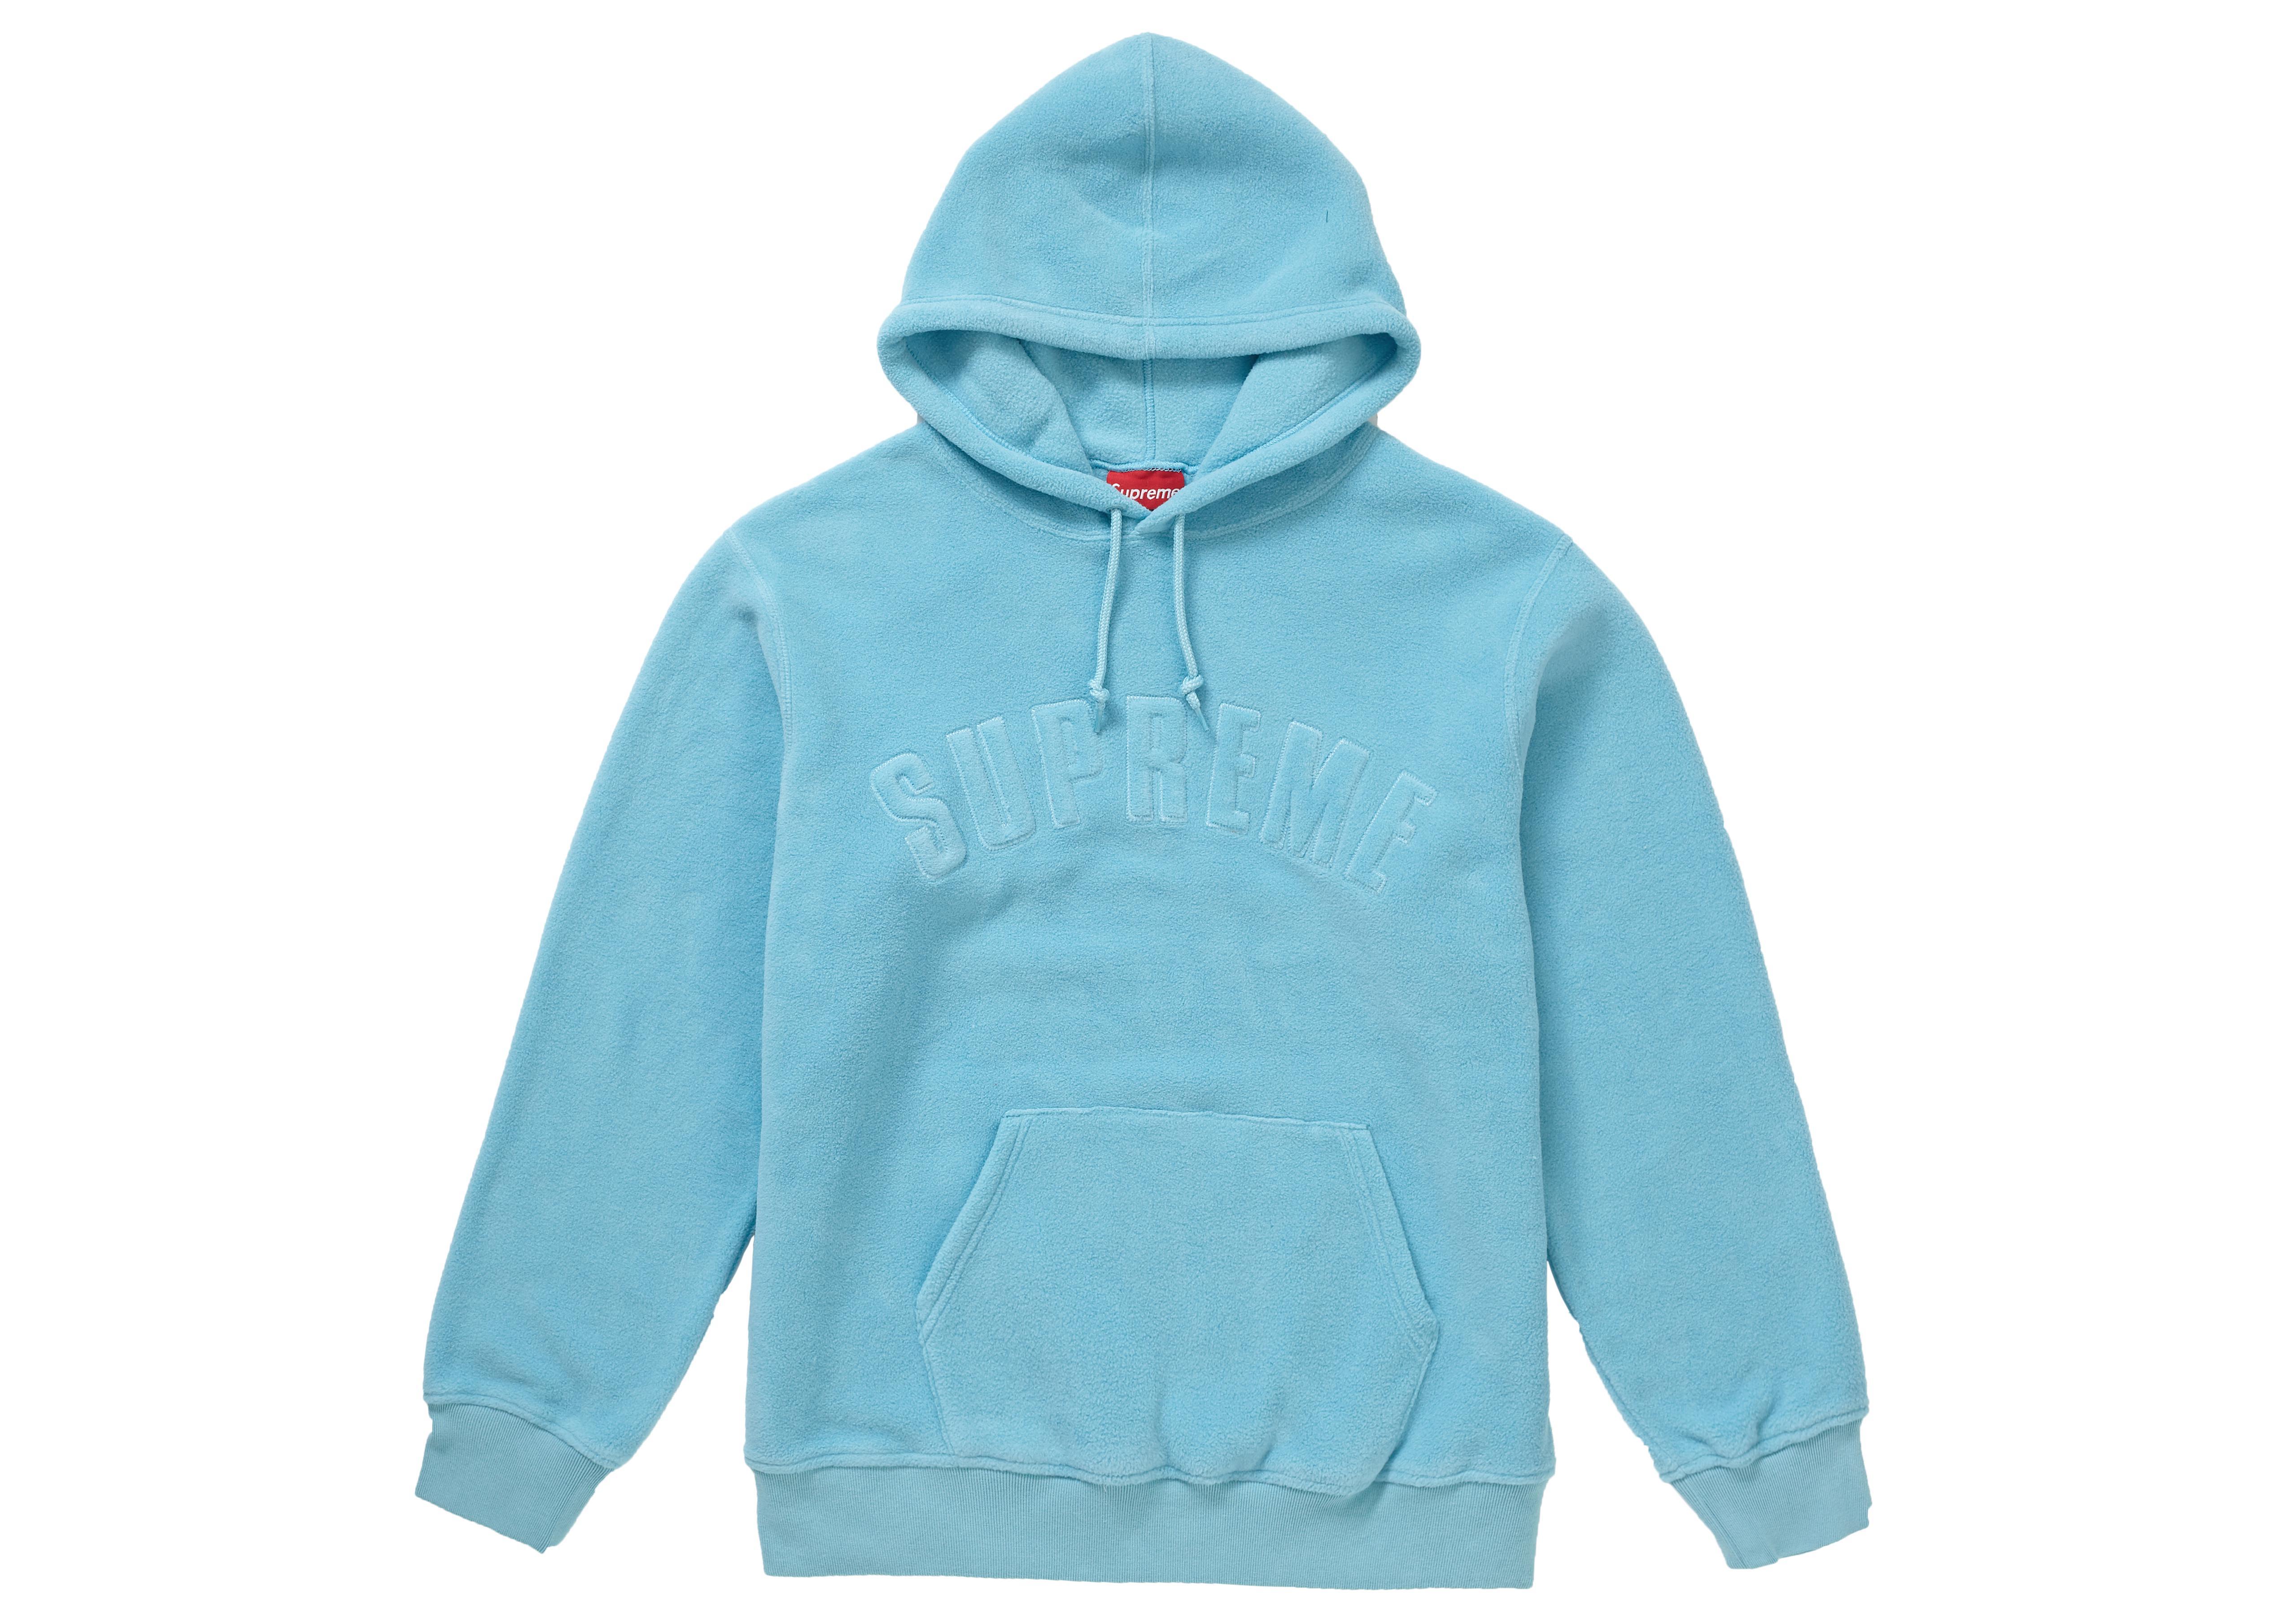 58c59534d4a4 Supreme - Polartec Hooded Sweatshirt (fw18) Light Blue for Men - Lyst. View  fullscreen